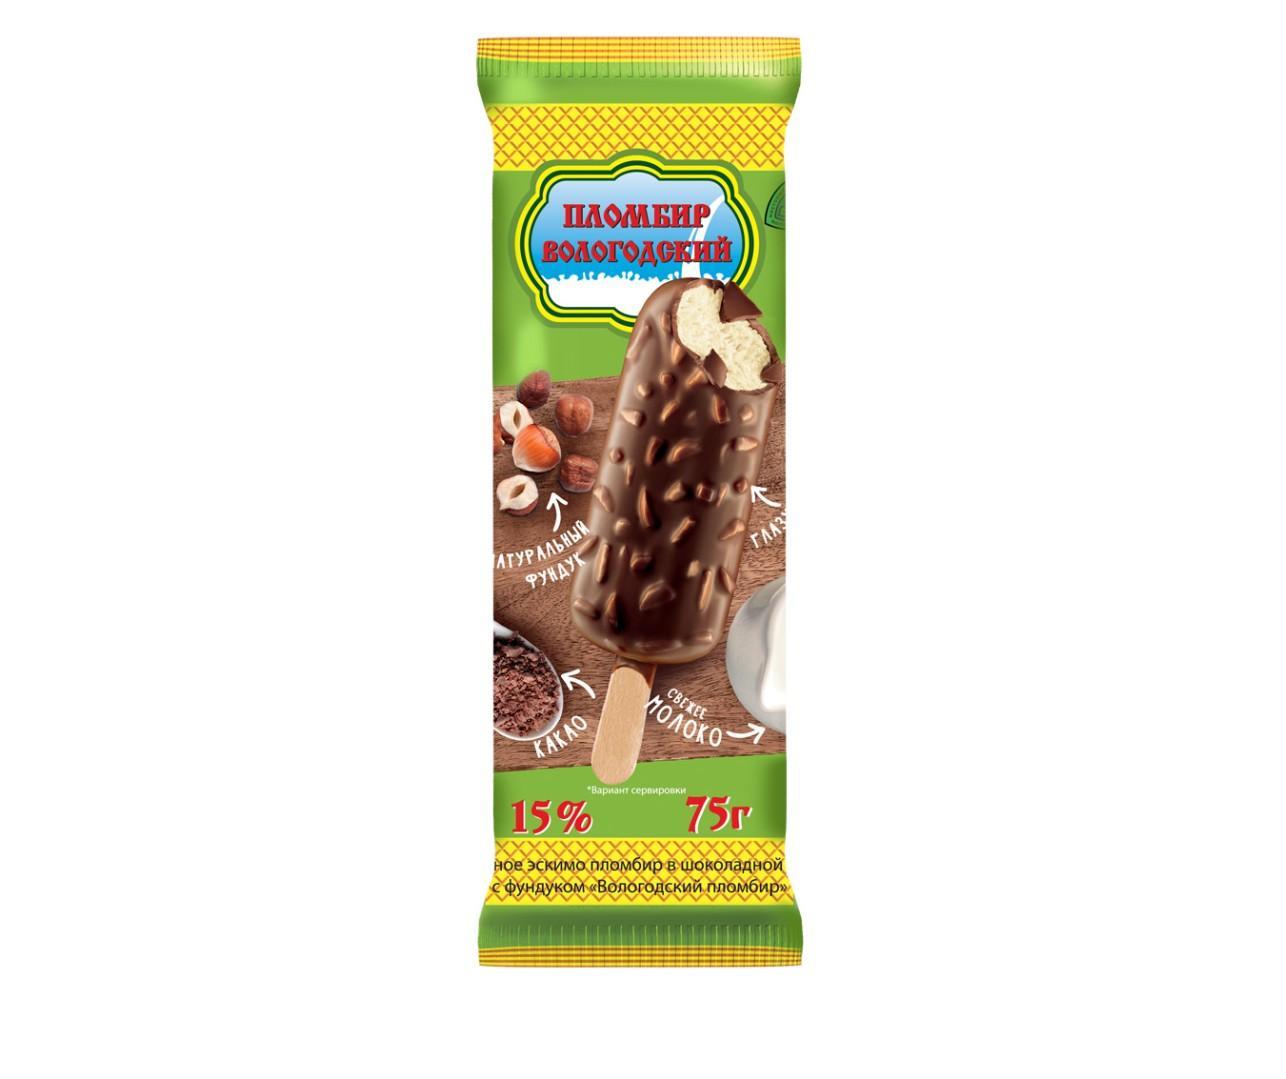 Мороженое Эскимо Вологодский пломб.вшок гл.с фундук.75гр.